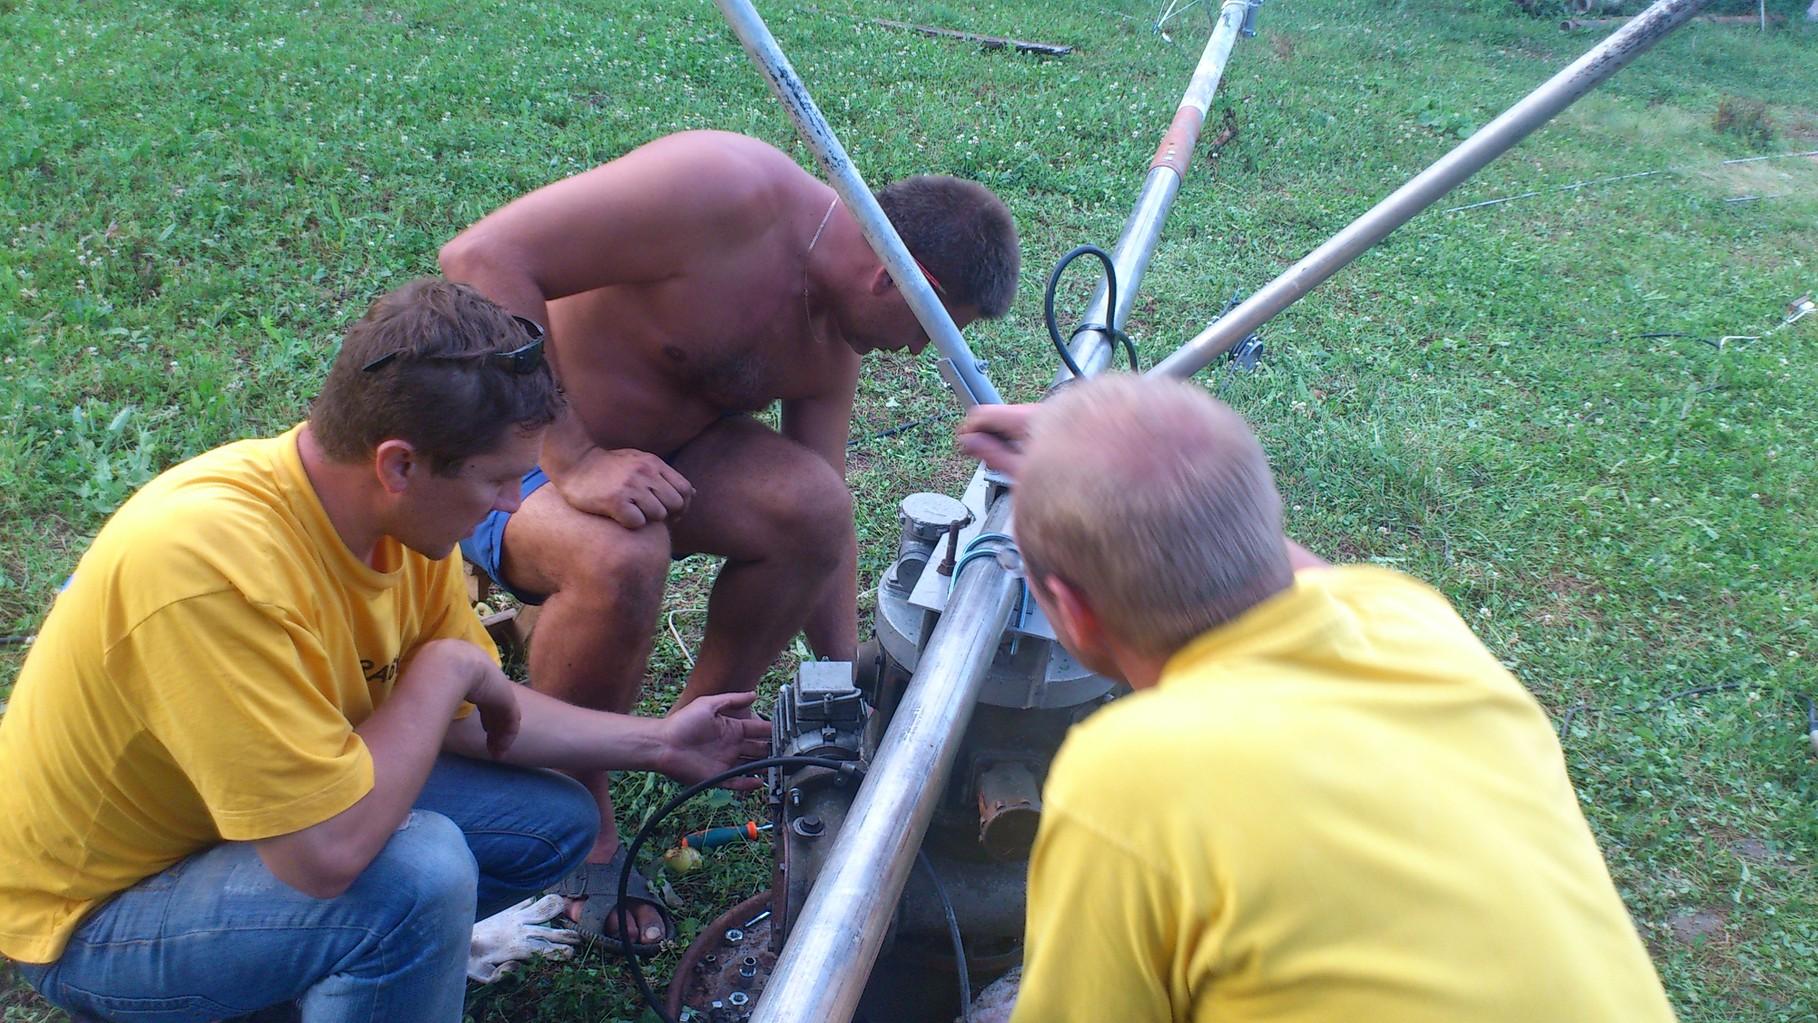 Antenna installing